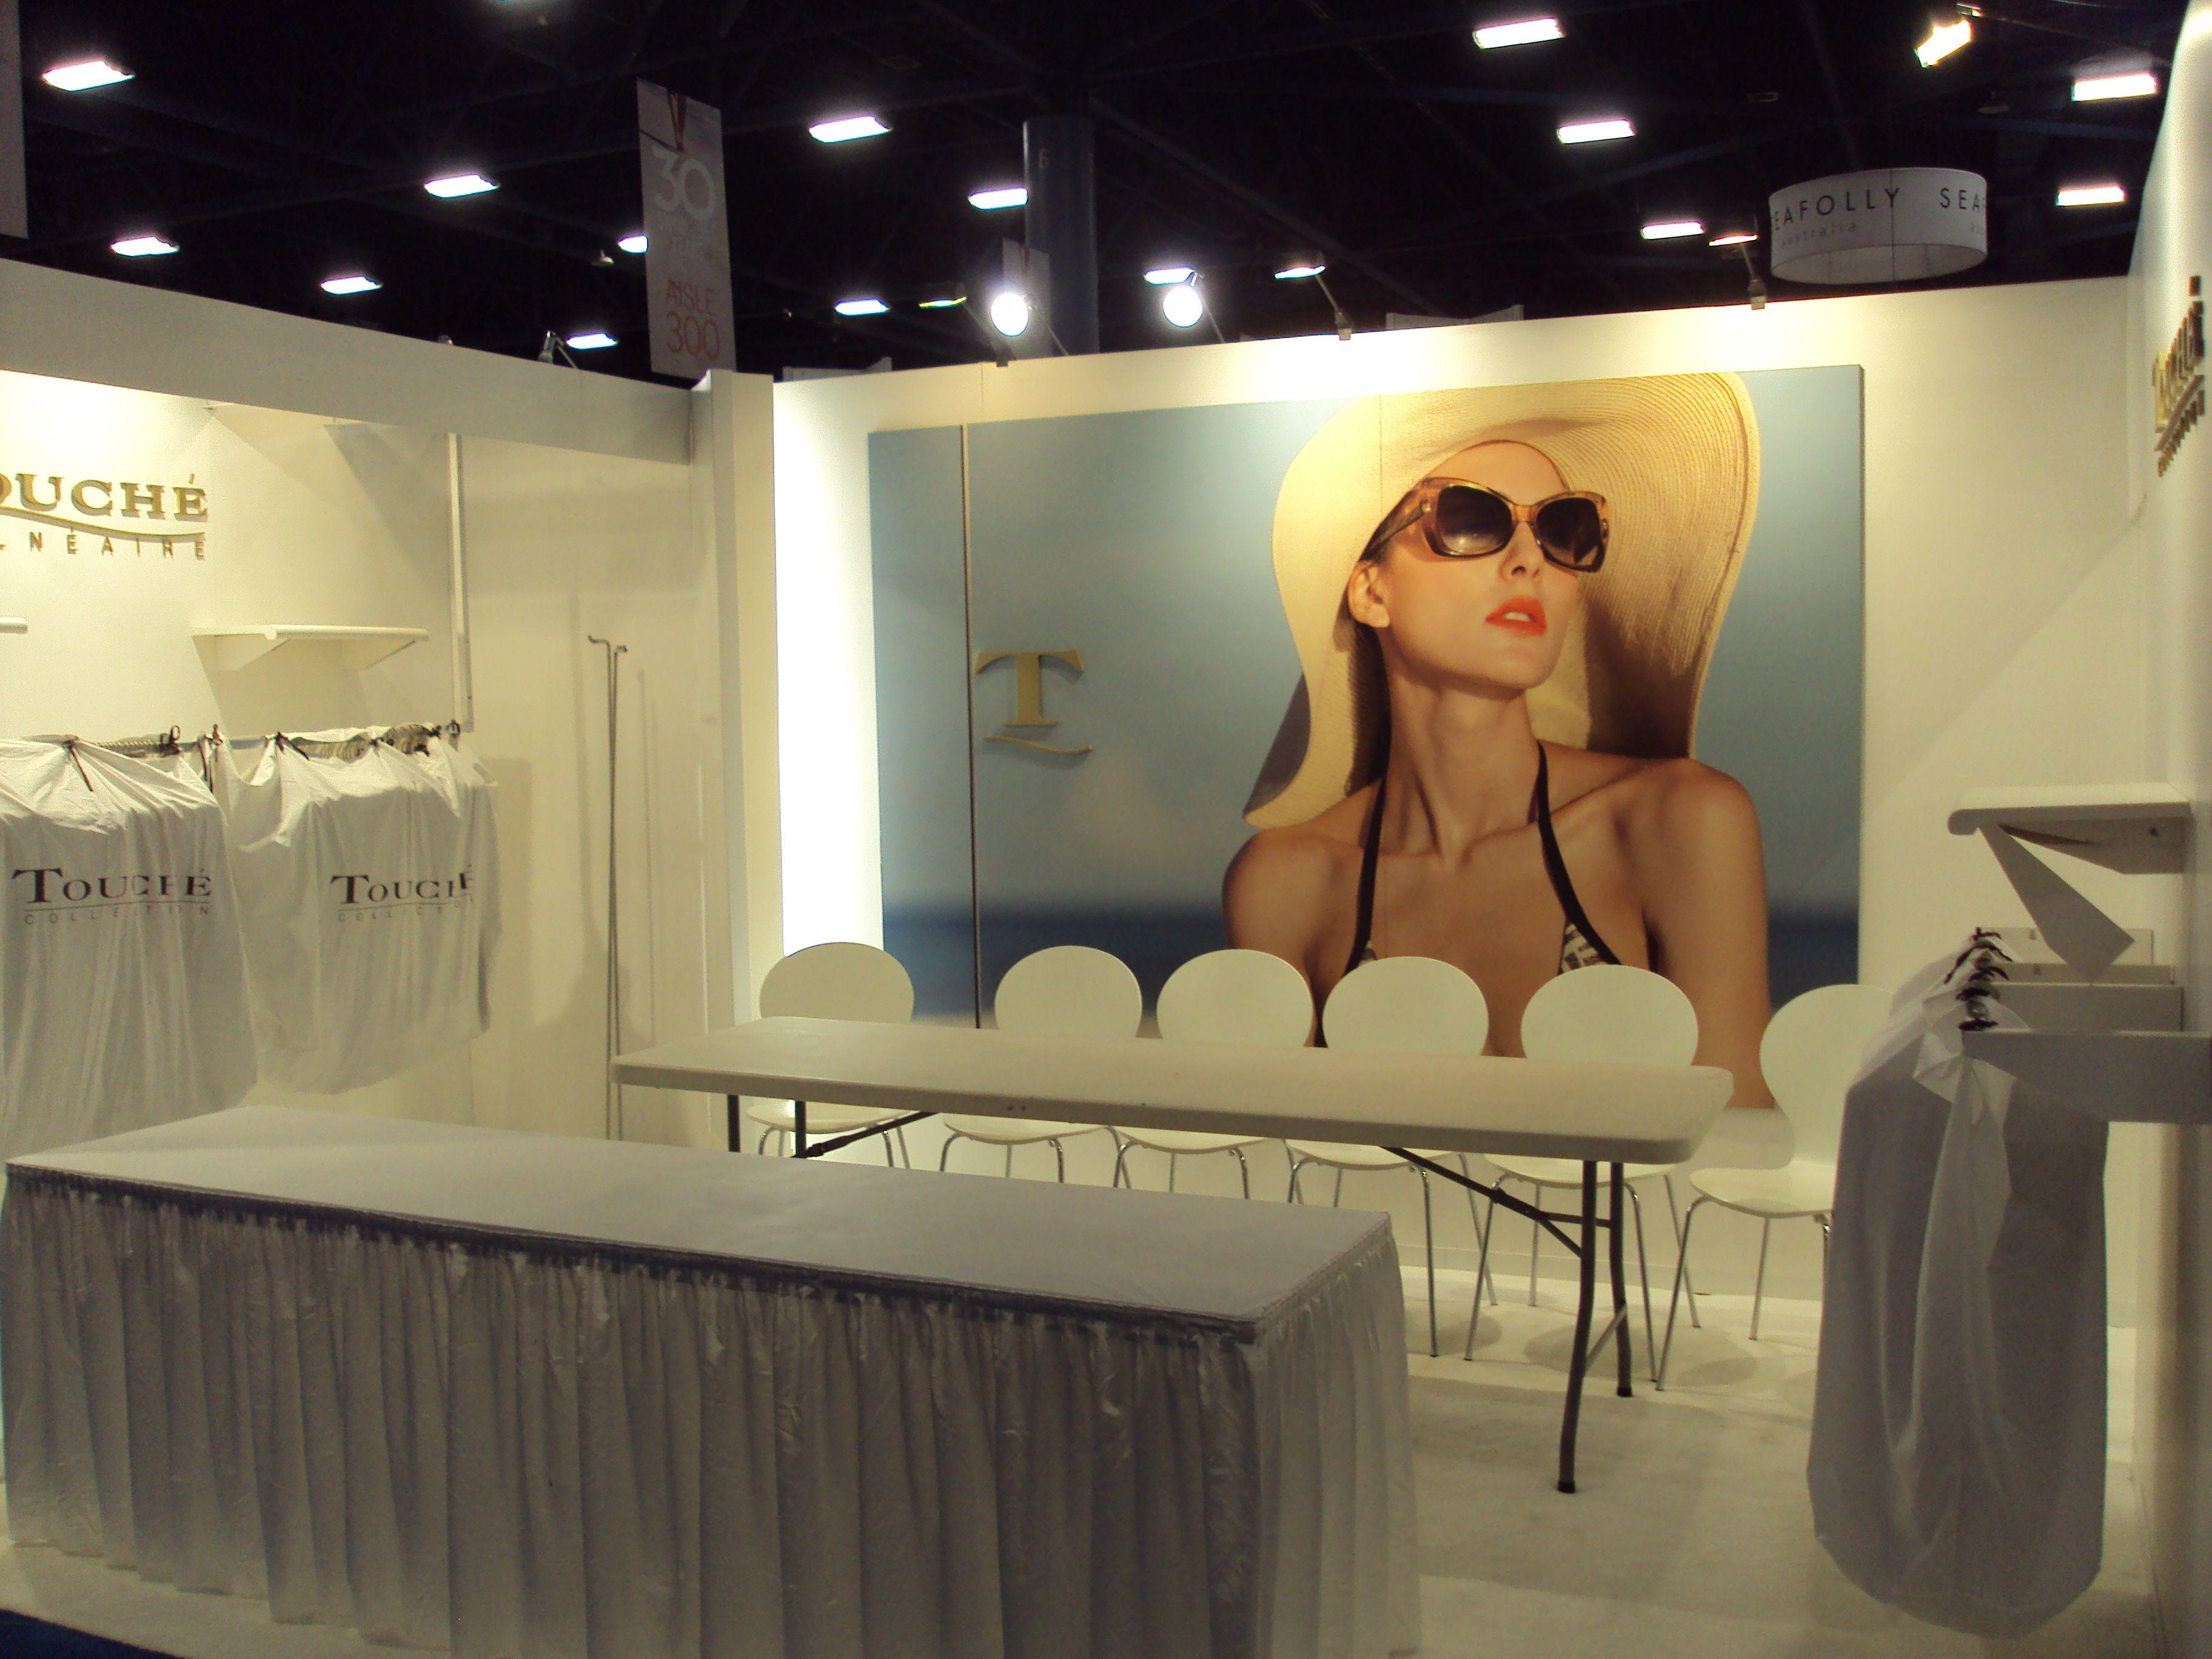 Touche USA Miami Swim Lingerie Show 2012